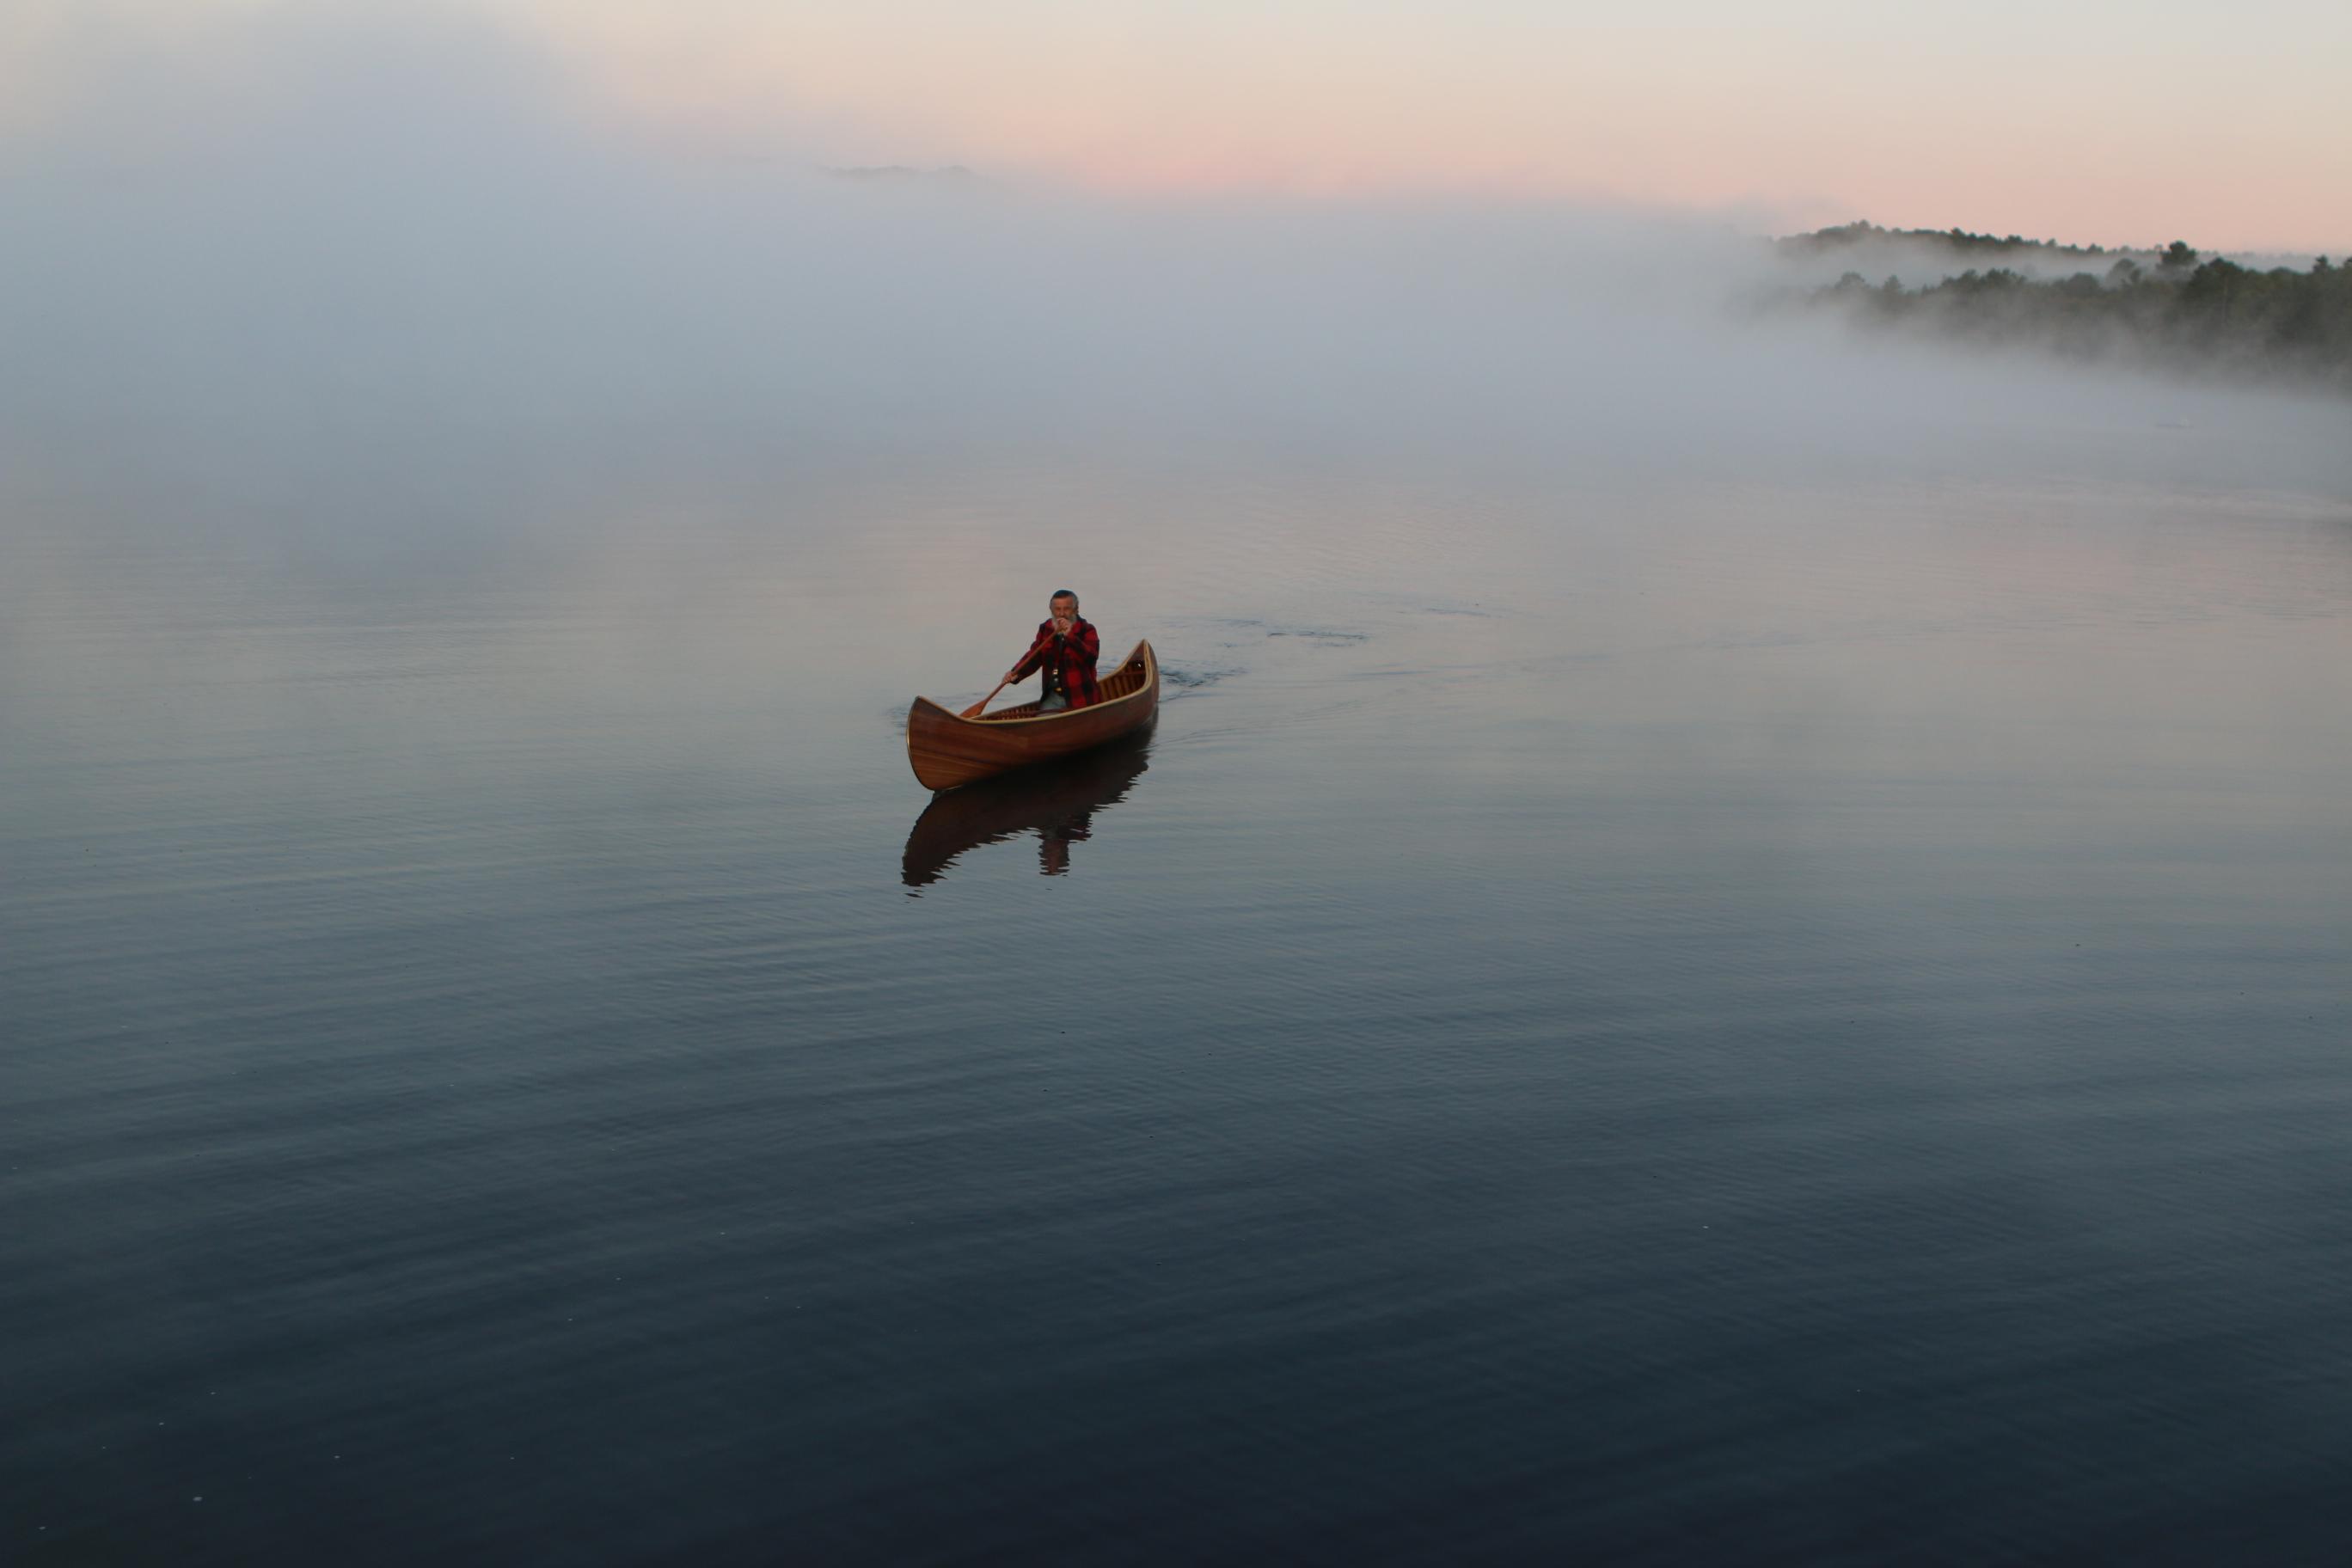 Langford Canoe Huron 16' Red Cedar aabbccdd112233